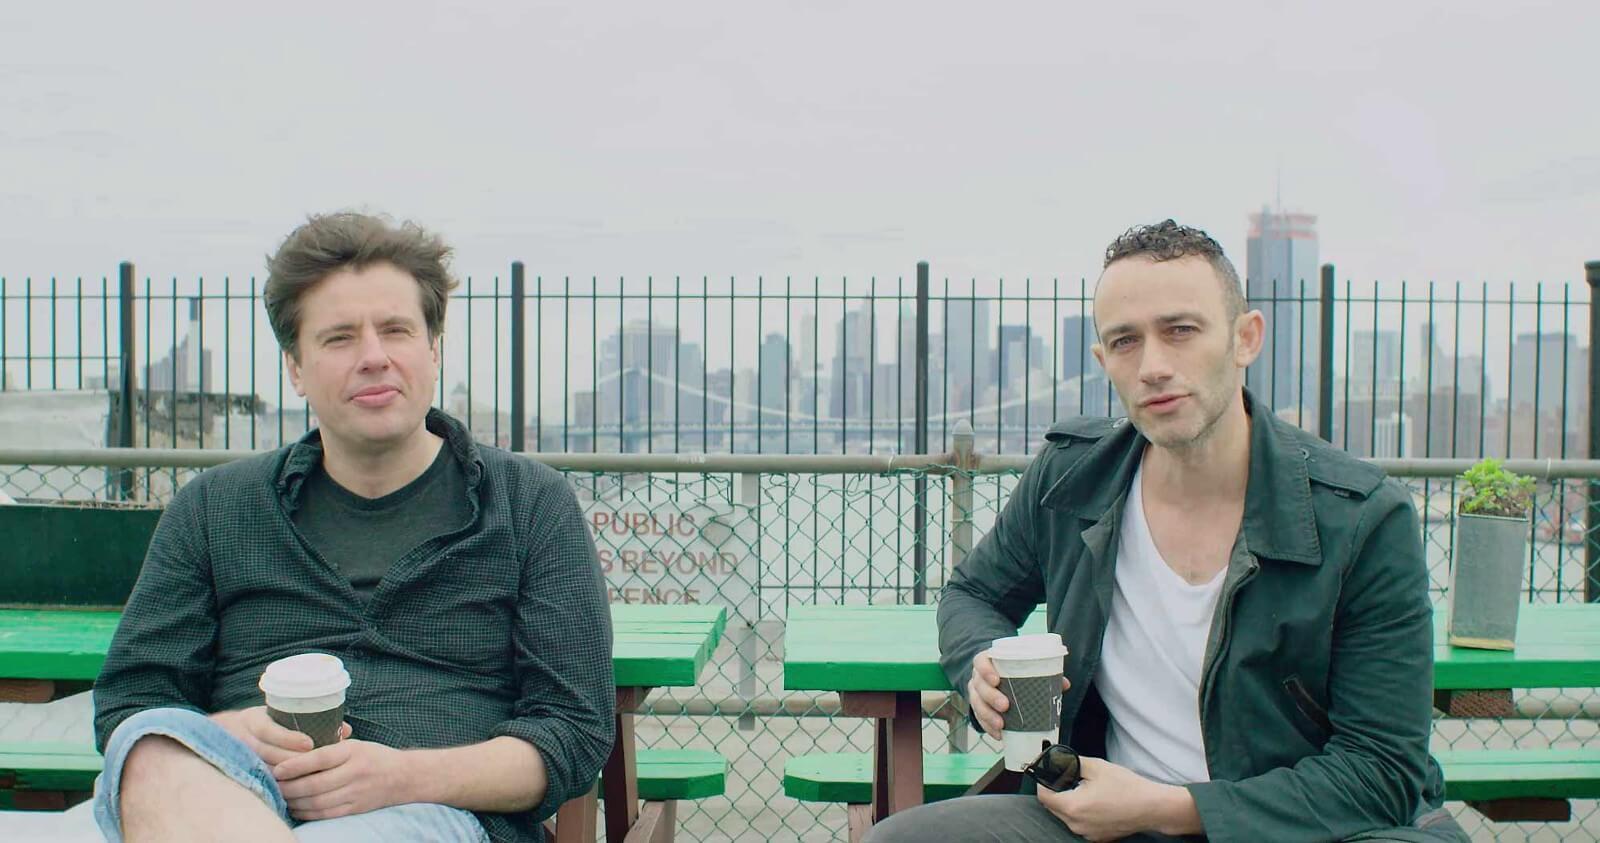 Snark.art co-founders, Andrey Alekhin, CEO, and Misha Libman, head of product